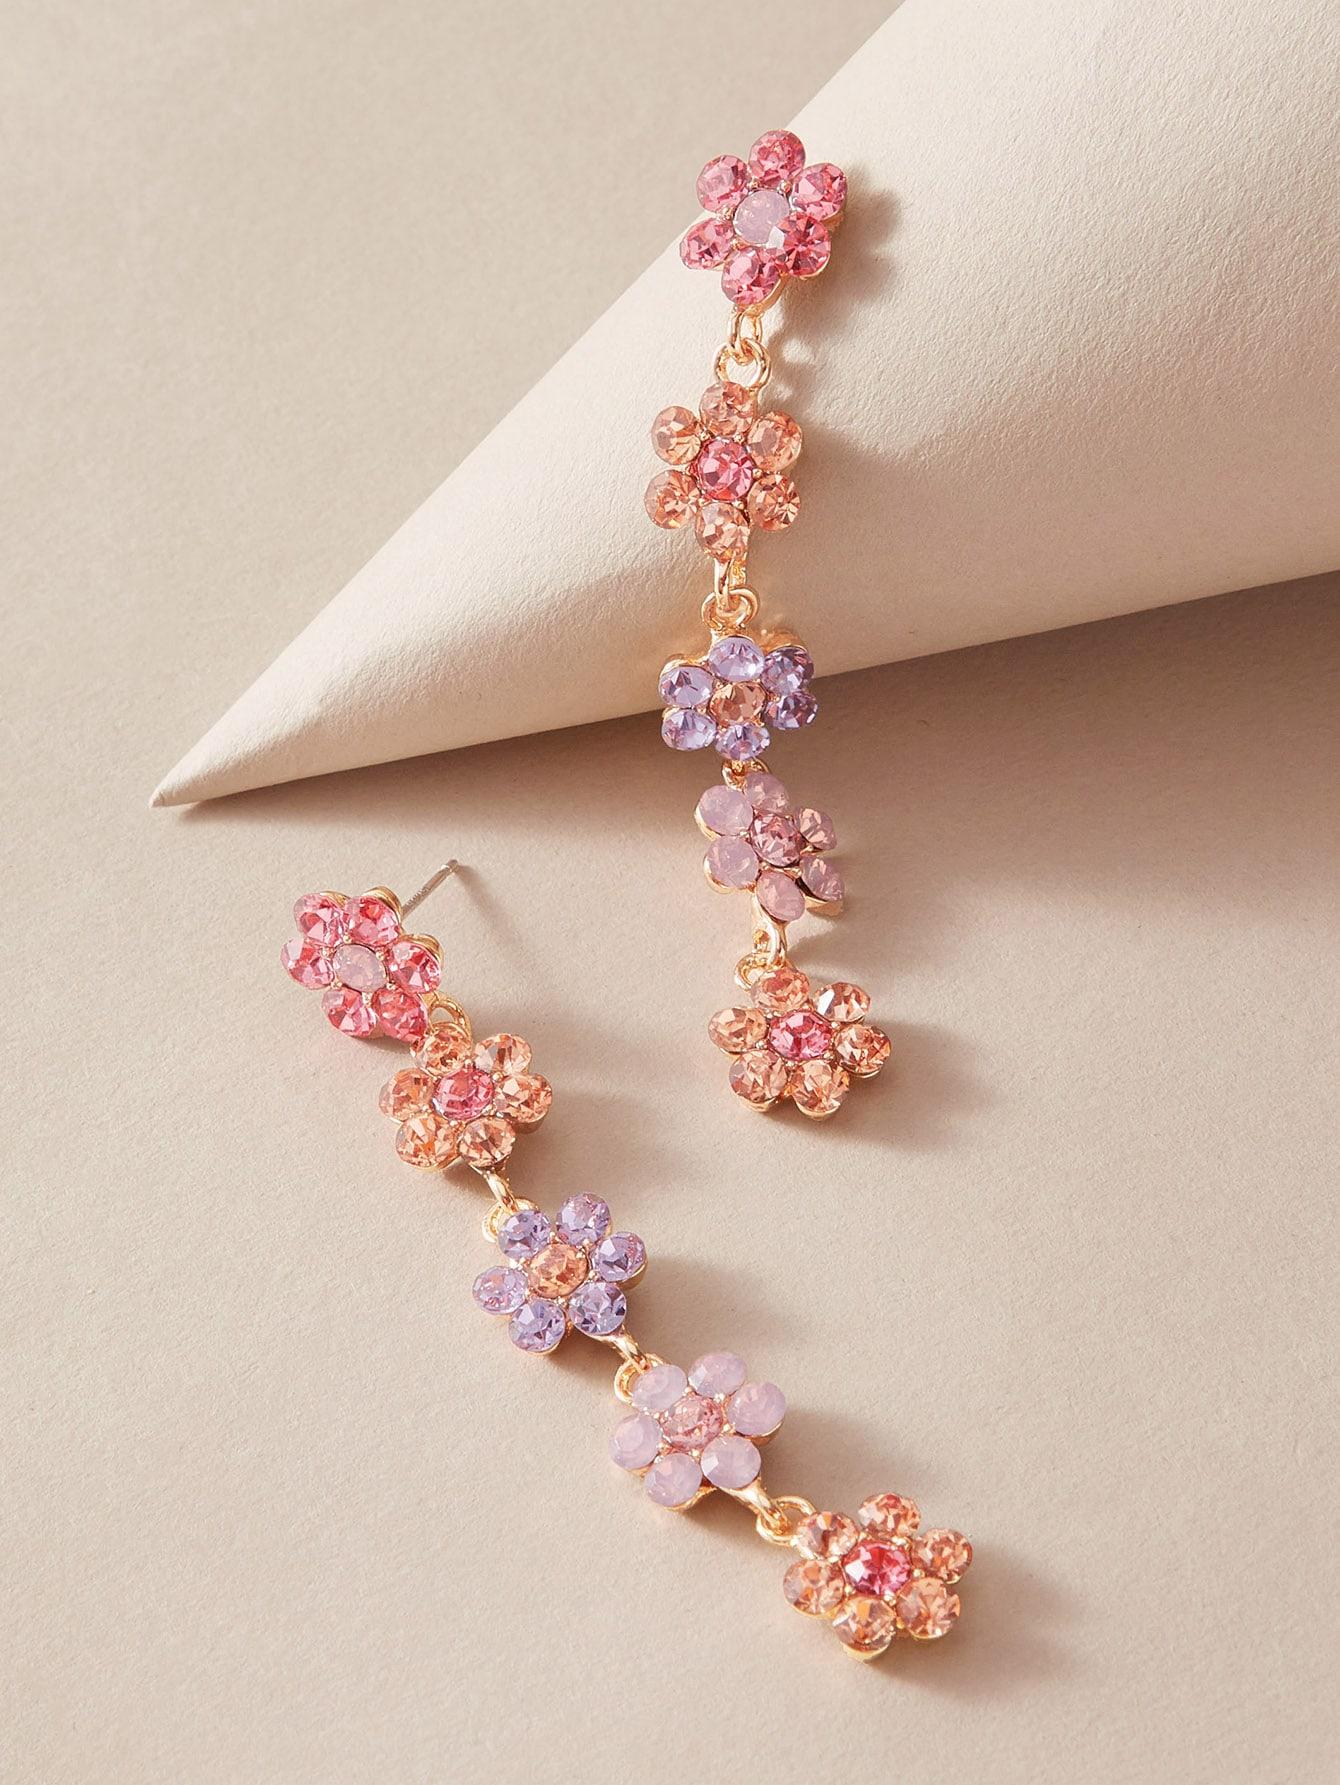 1pair Rhinestone Decor Flower Drop Earrings thumbnail